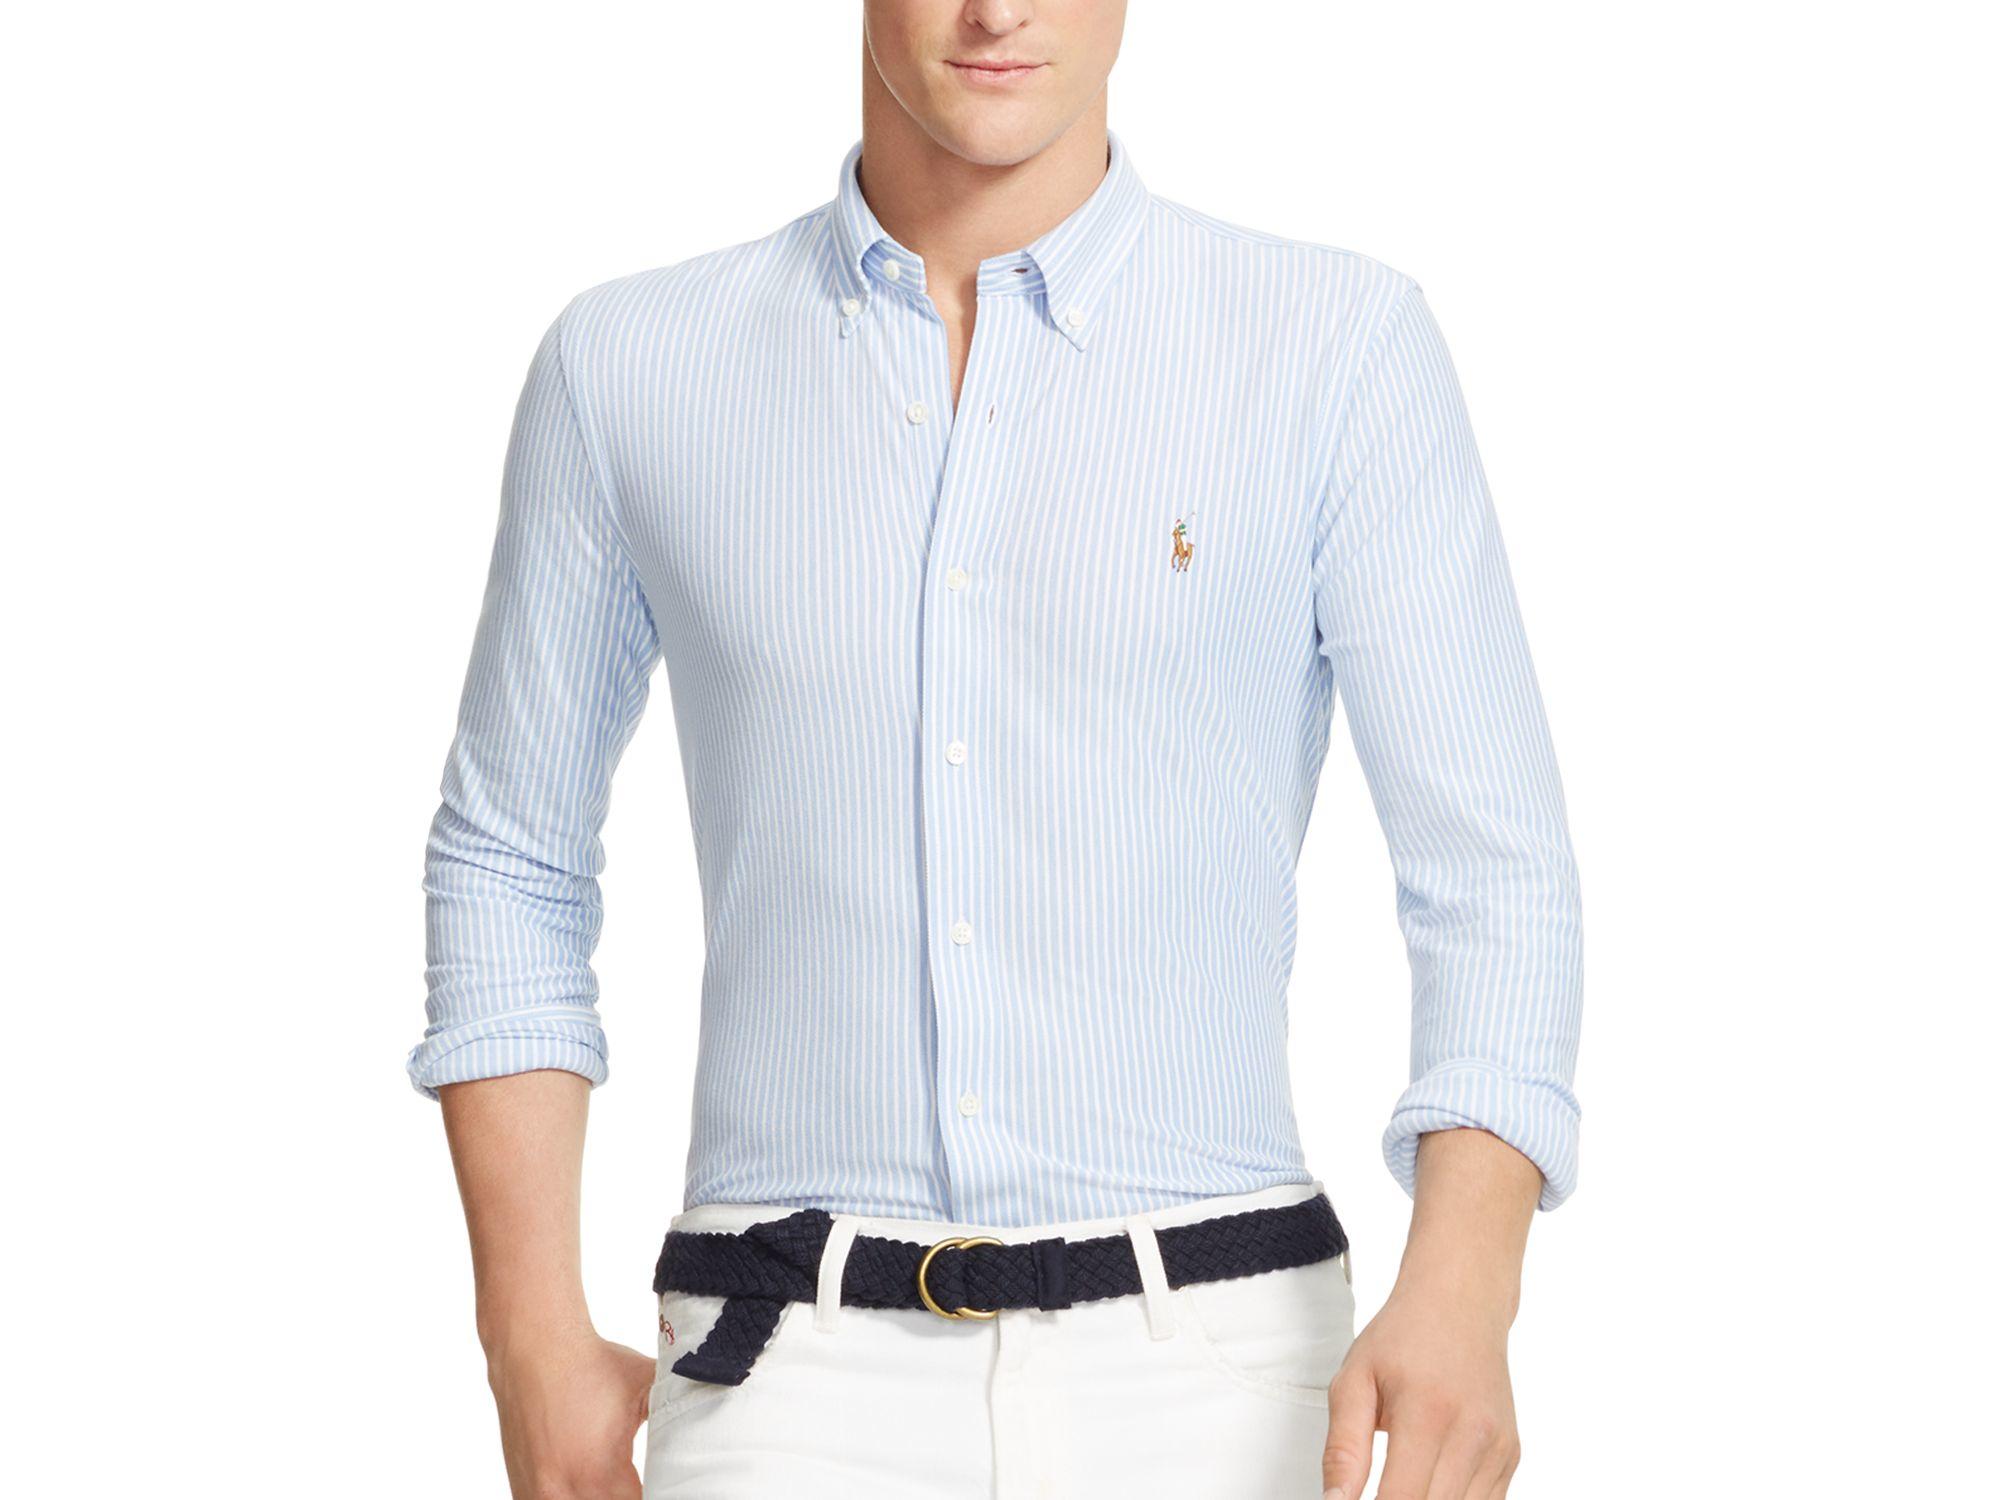 e5004c9cf Polo Ralph Lauren Knit Oxford Shirt Slim Fit Button Down In Blue